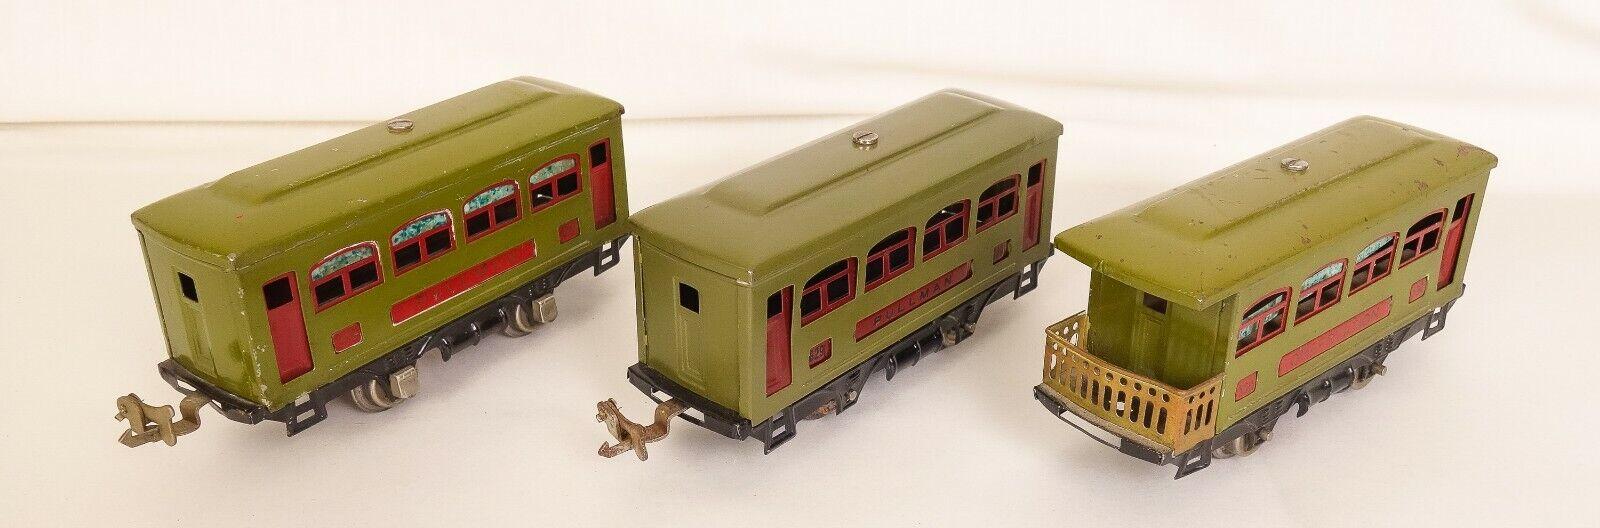 LIONEL  529-530-629 SET OF (3) OLIVE & rot FOUR WHEEL PASSENGER CARS-NICE